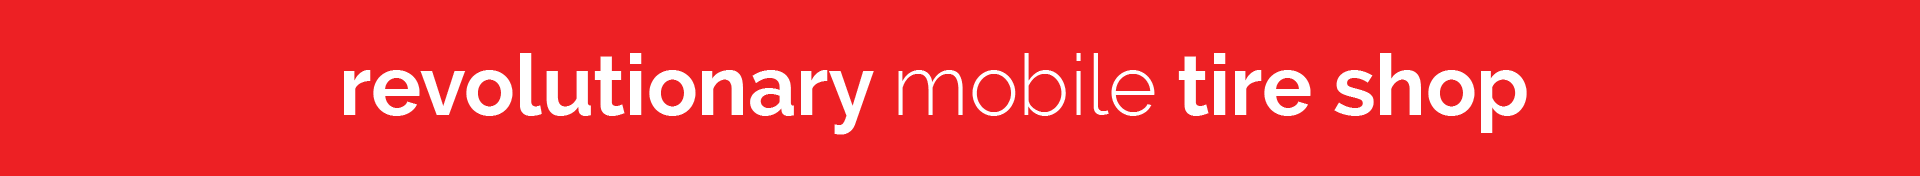 getTREAD the revolutionary mobile tire shop